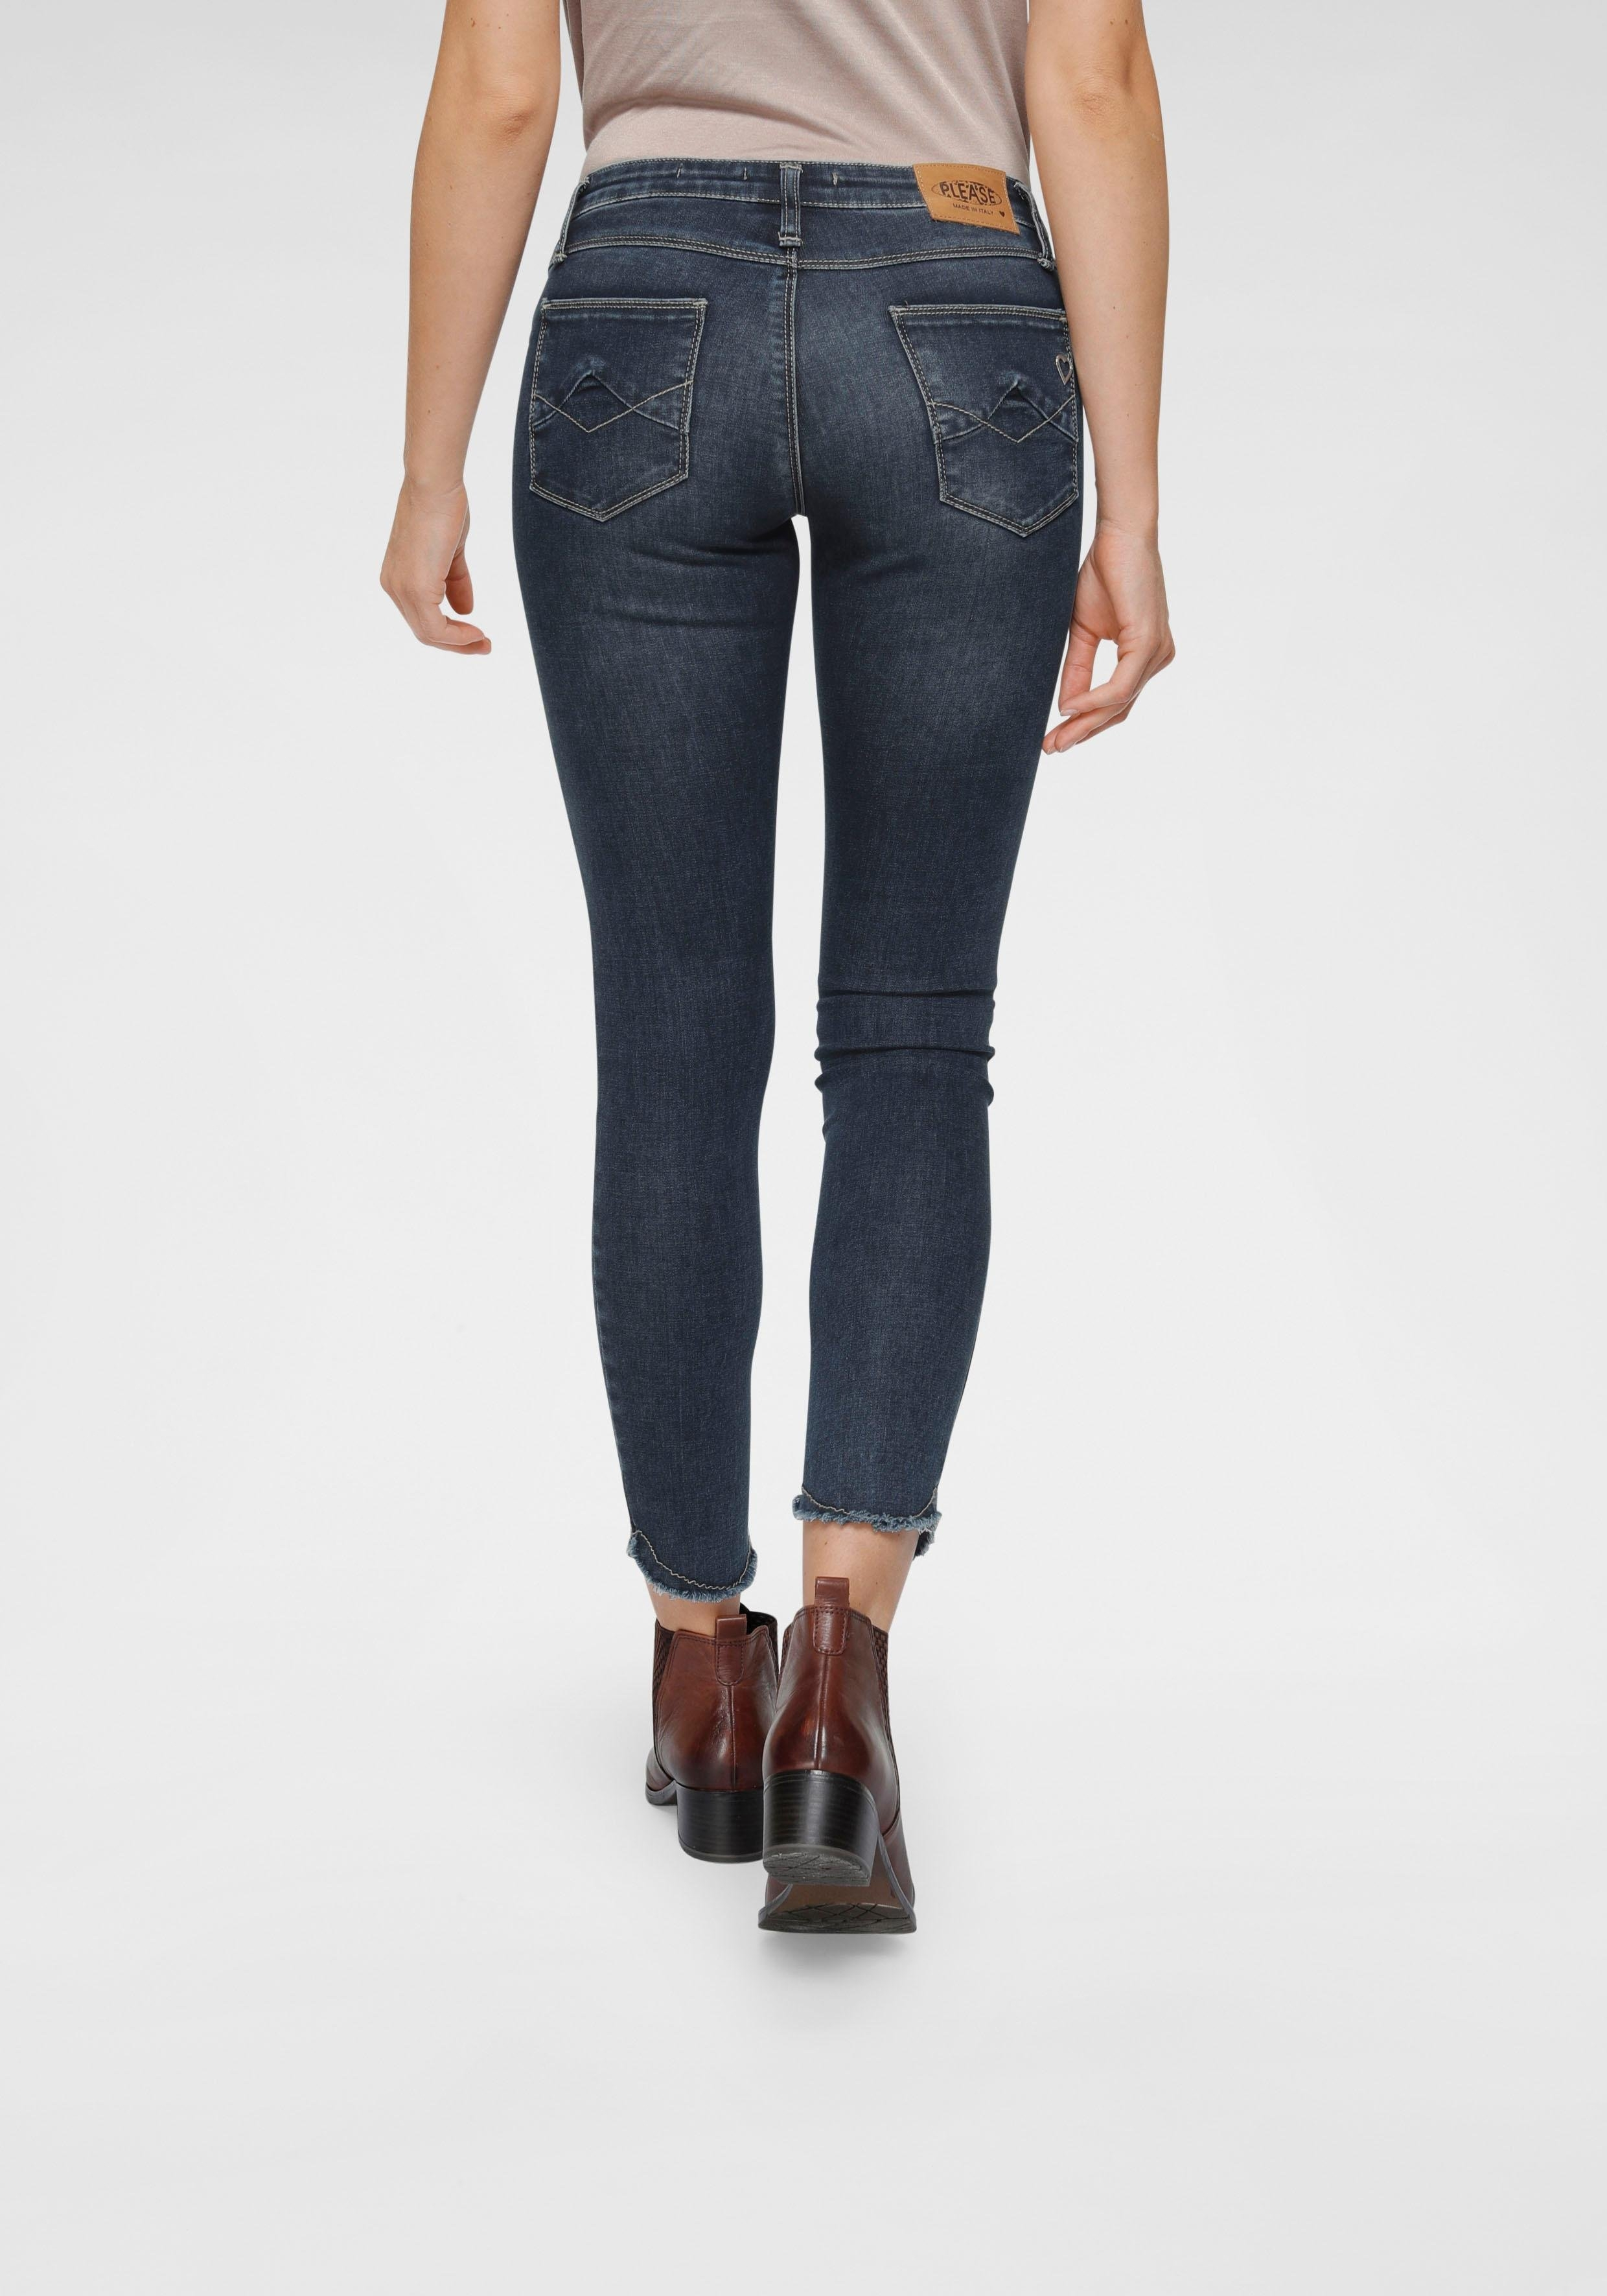 Please Jeans slim fit jeans »P930« nu online kopen bij OTTO